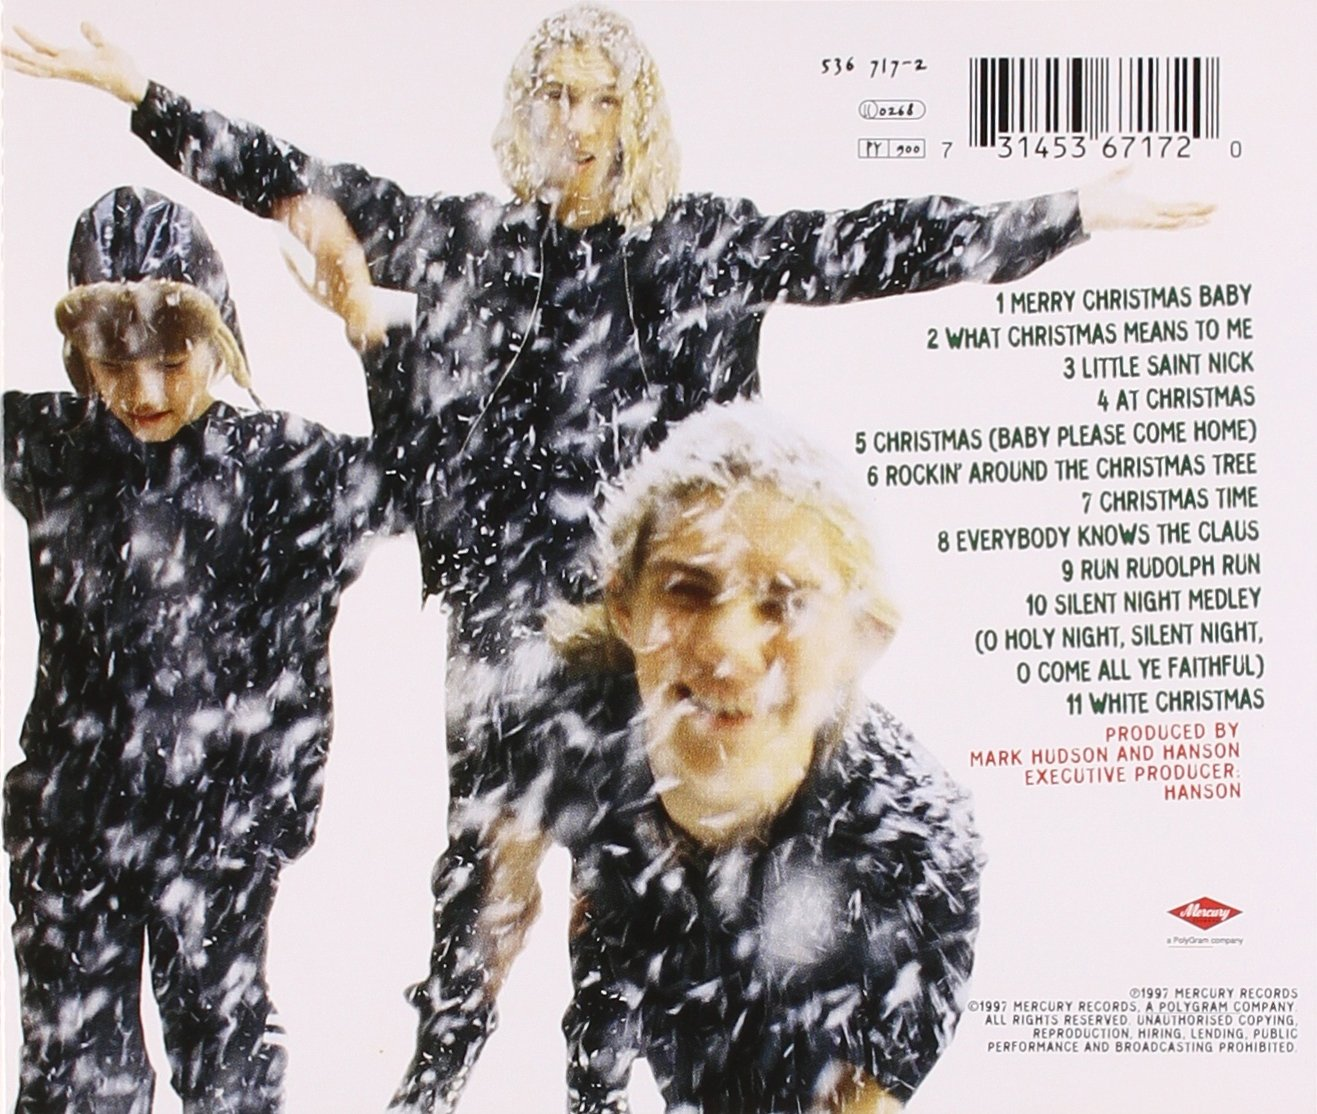 Hanson - Snowed In - Amazon.com Music